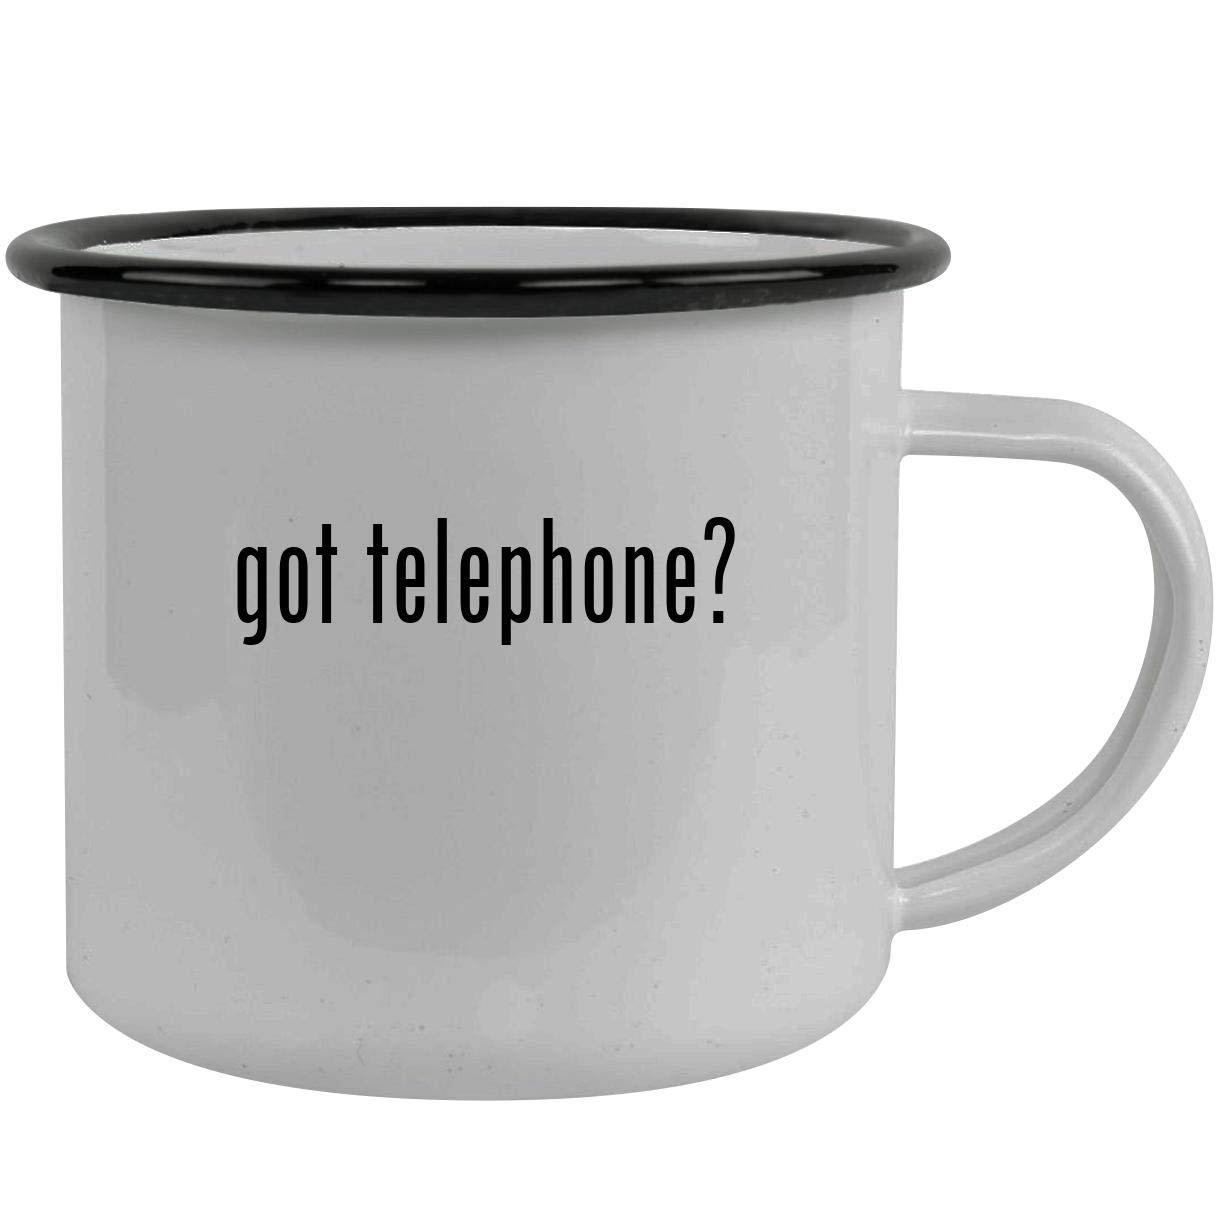 got telephone? - Stainless Steel 12oz Camping Mug, Black